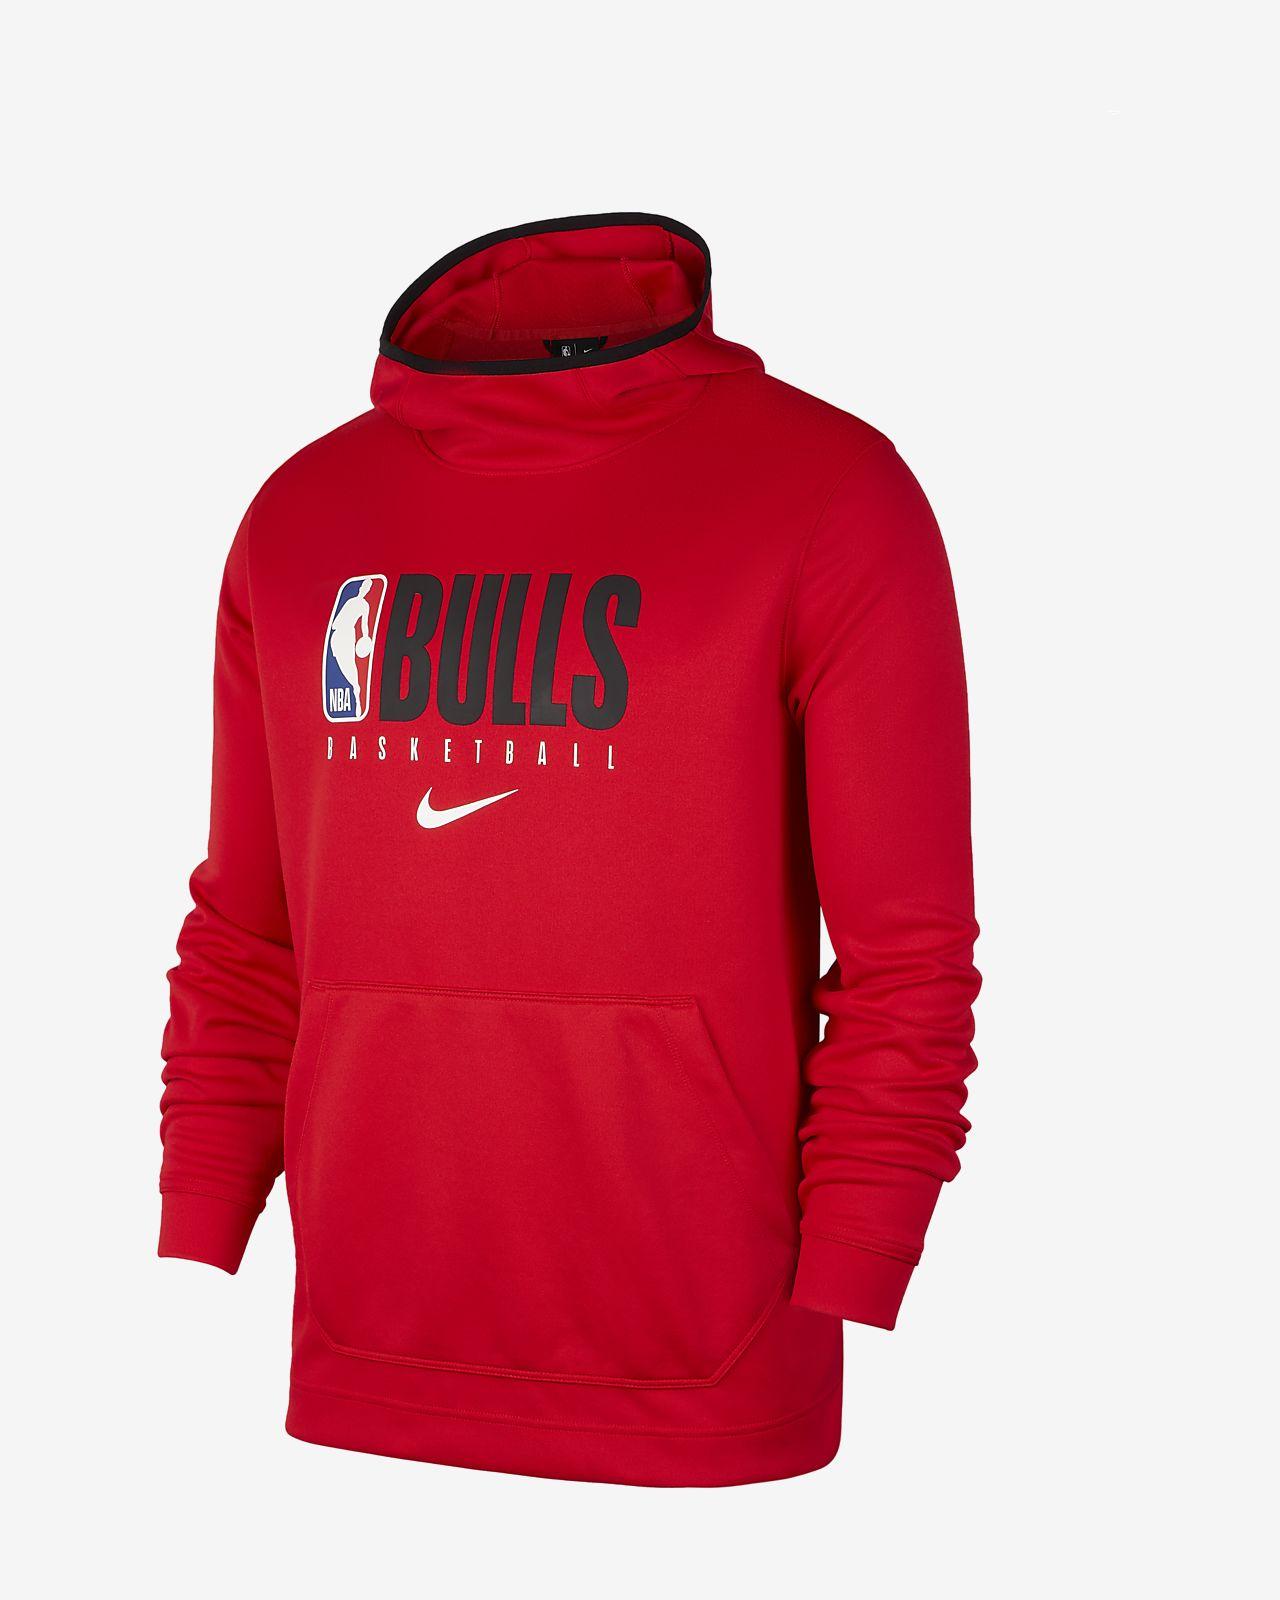 Felpa Chicago Bulls con cappuccio Nike Spotlight NBA Uomo